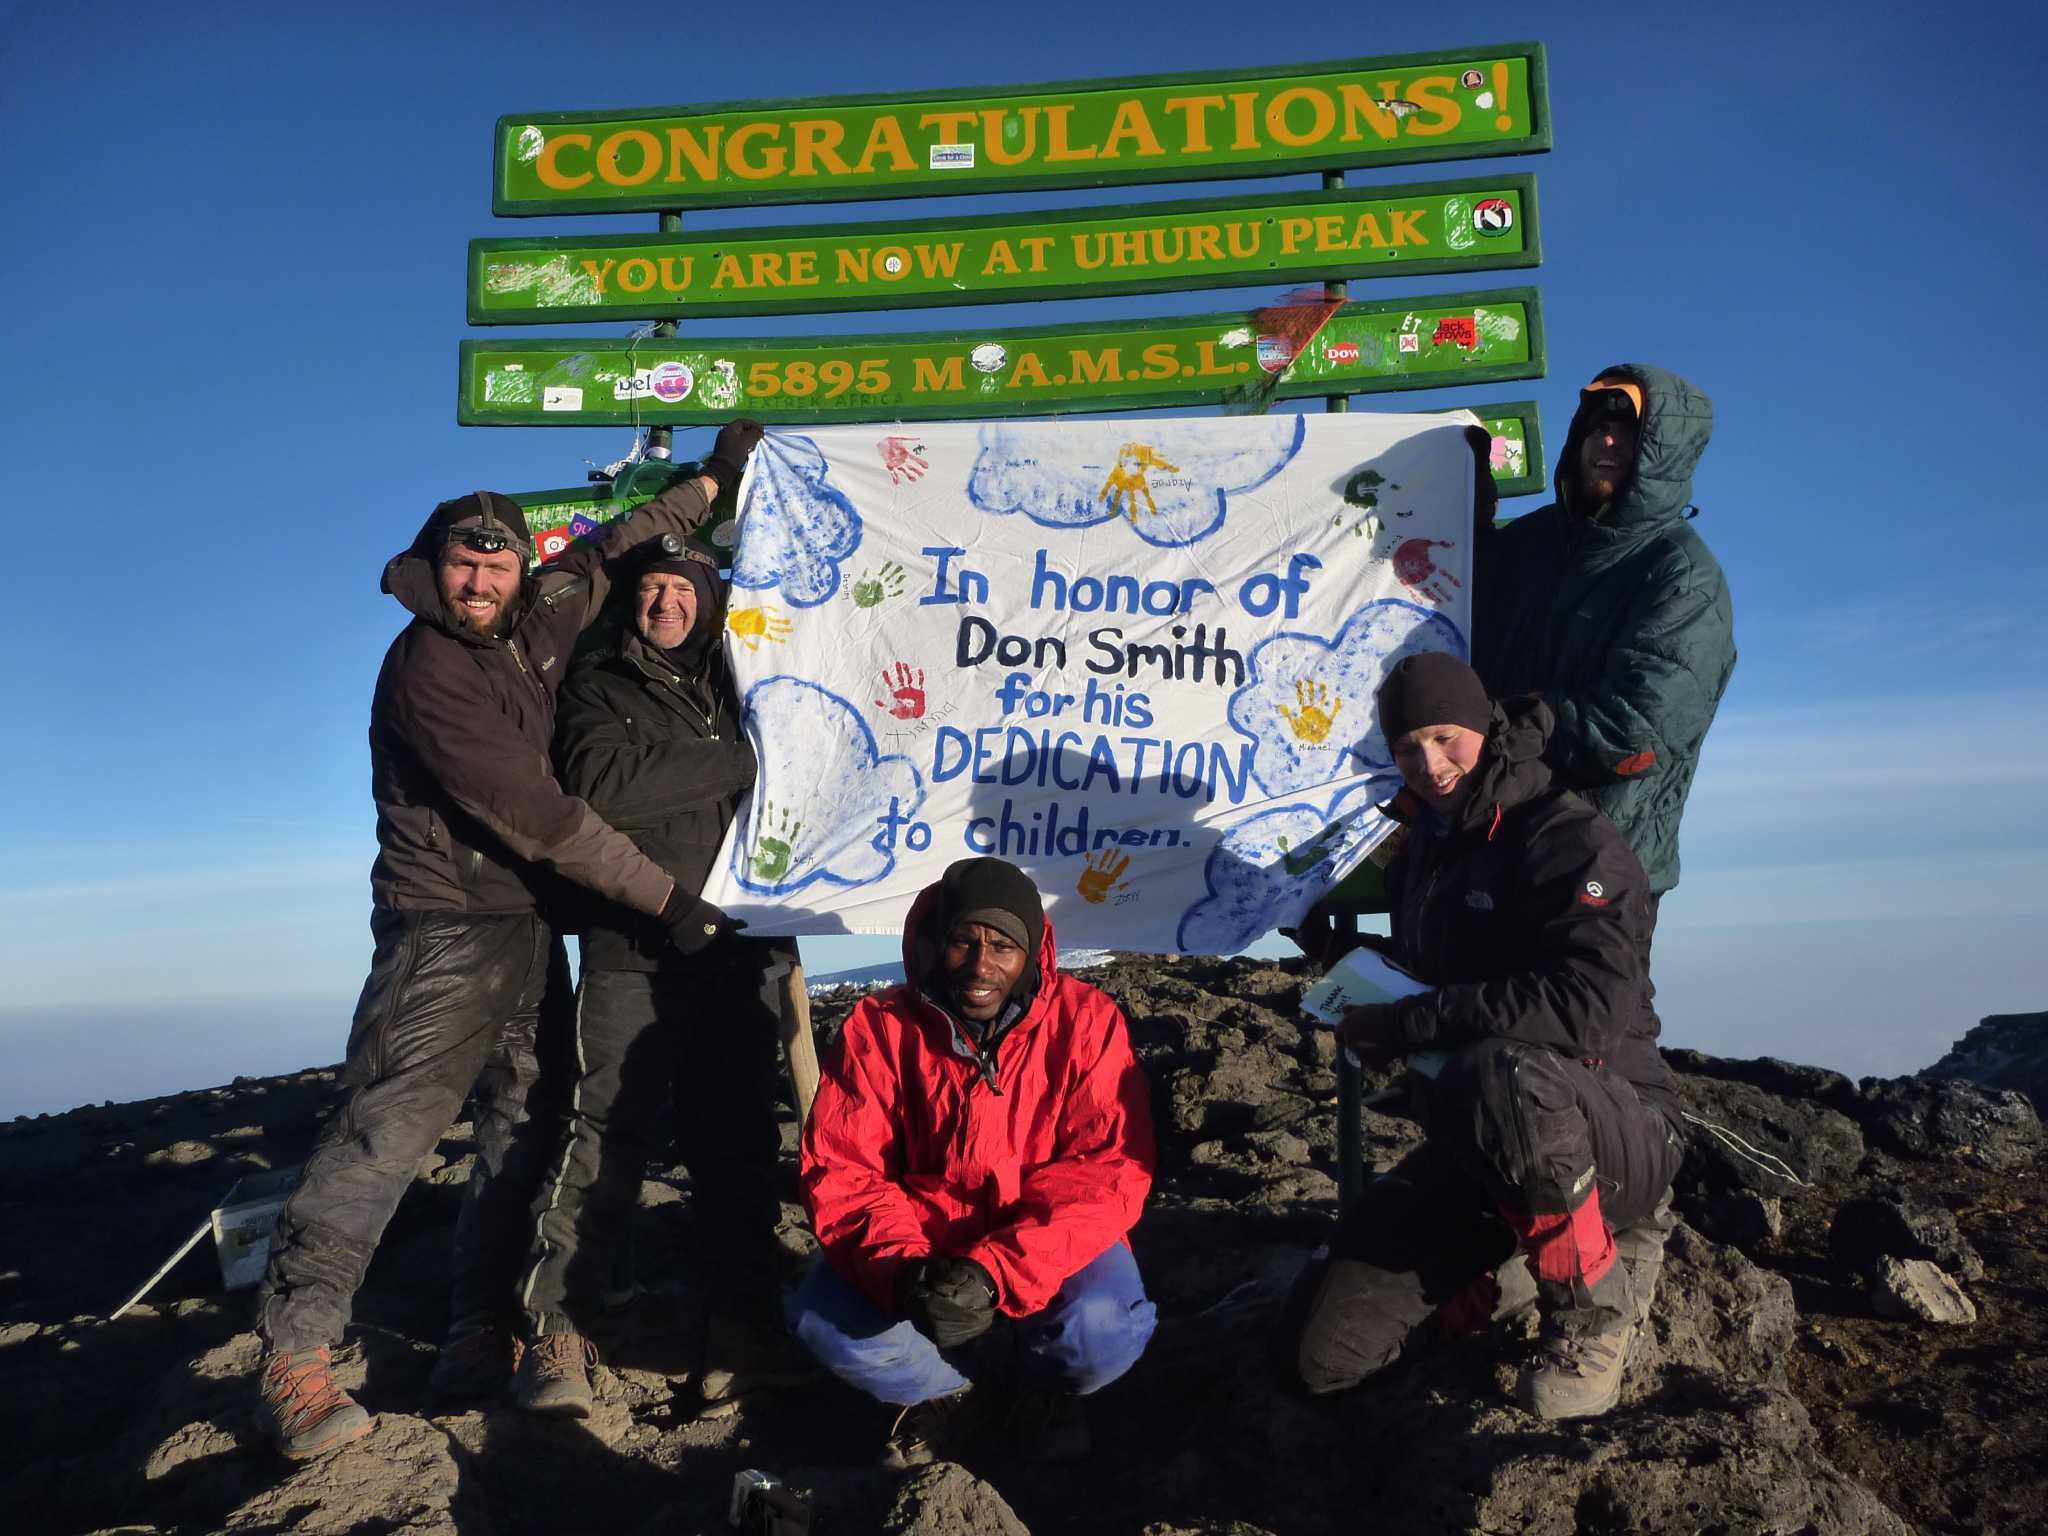 Pre Owned Cars >> Mount Kilimanjaro trek celebrates friend's career of service to kids